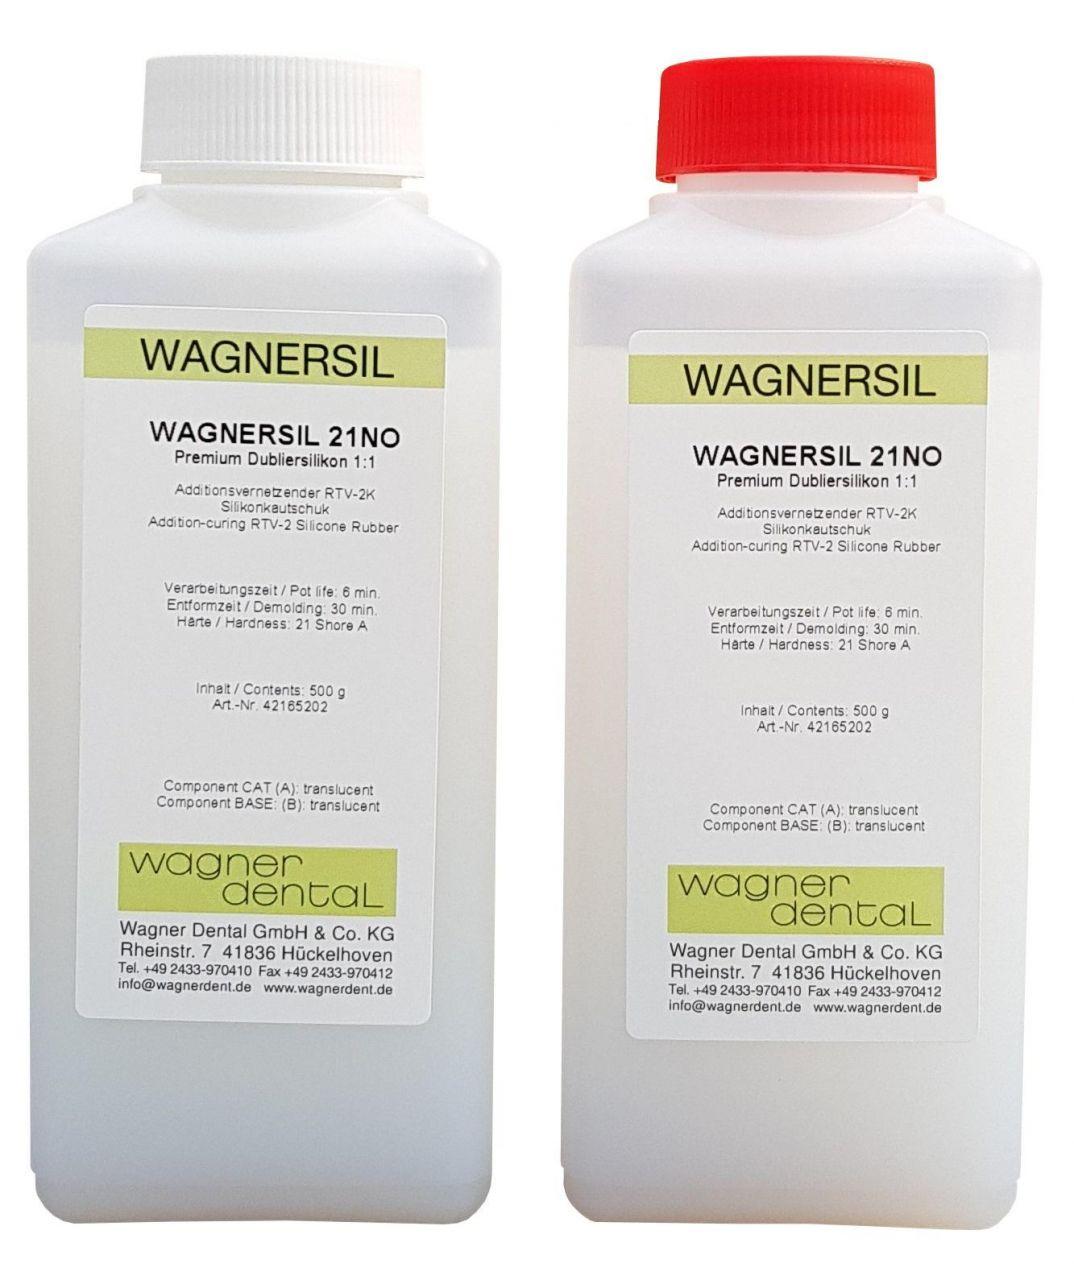 Wagnersil Premium 21 NO transluzent Shore 21 EFZ 30 min 1:1